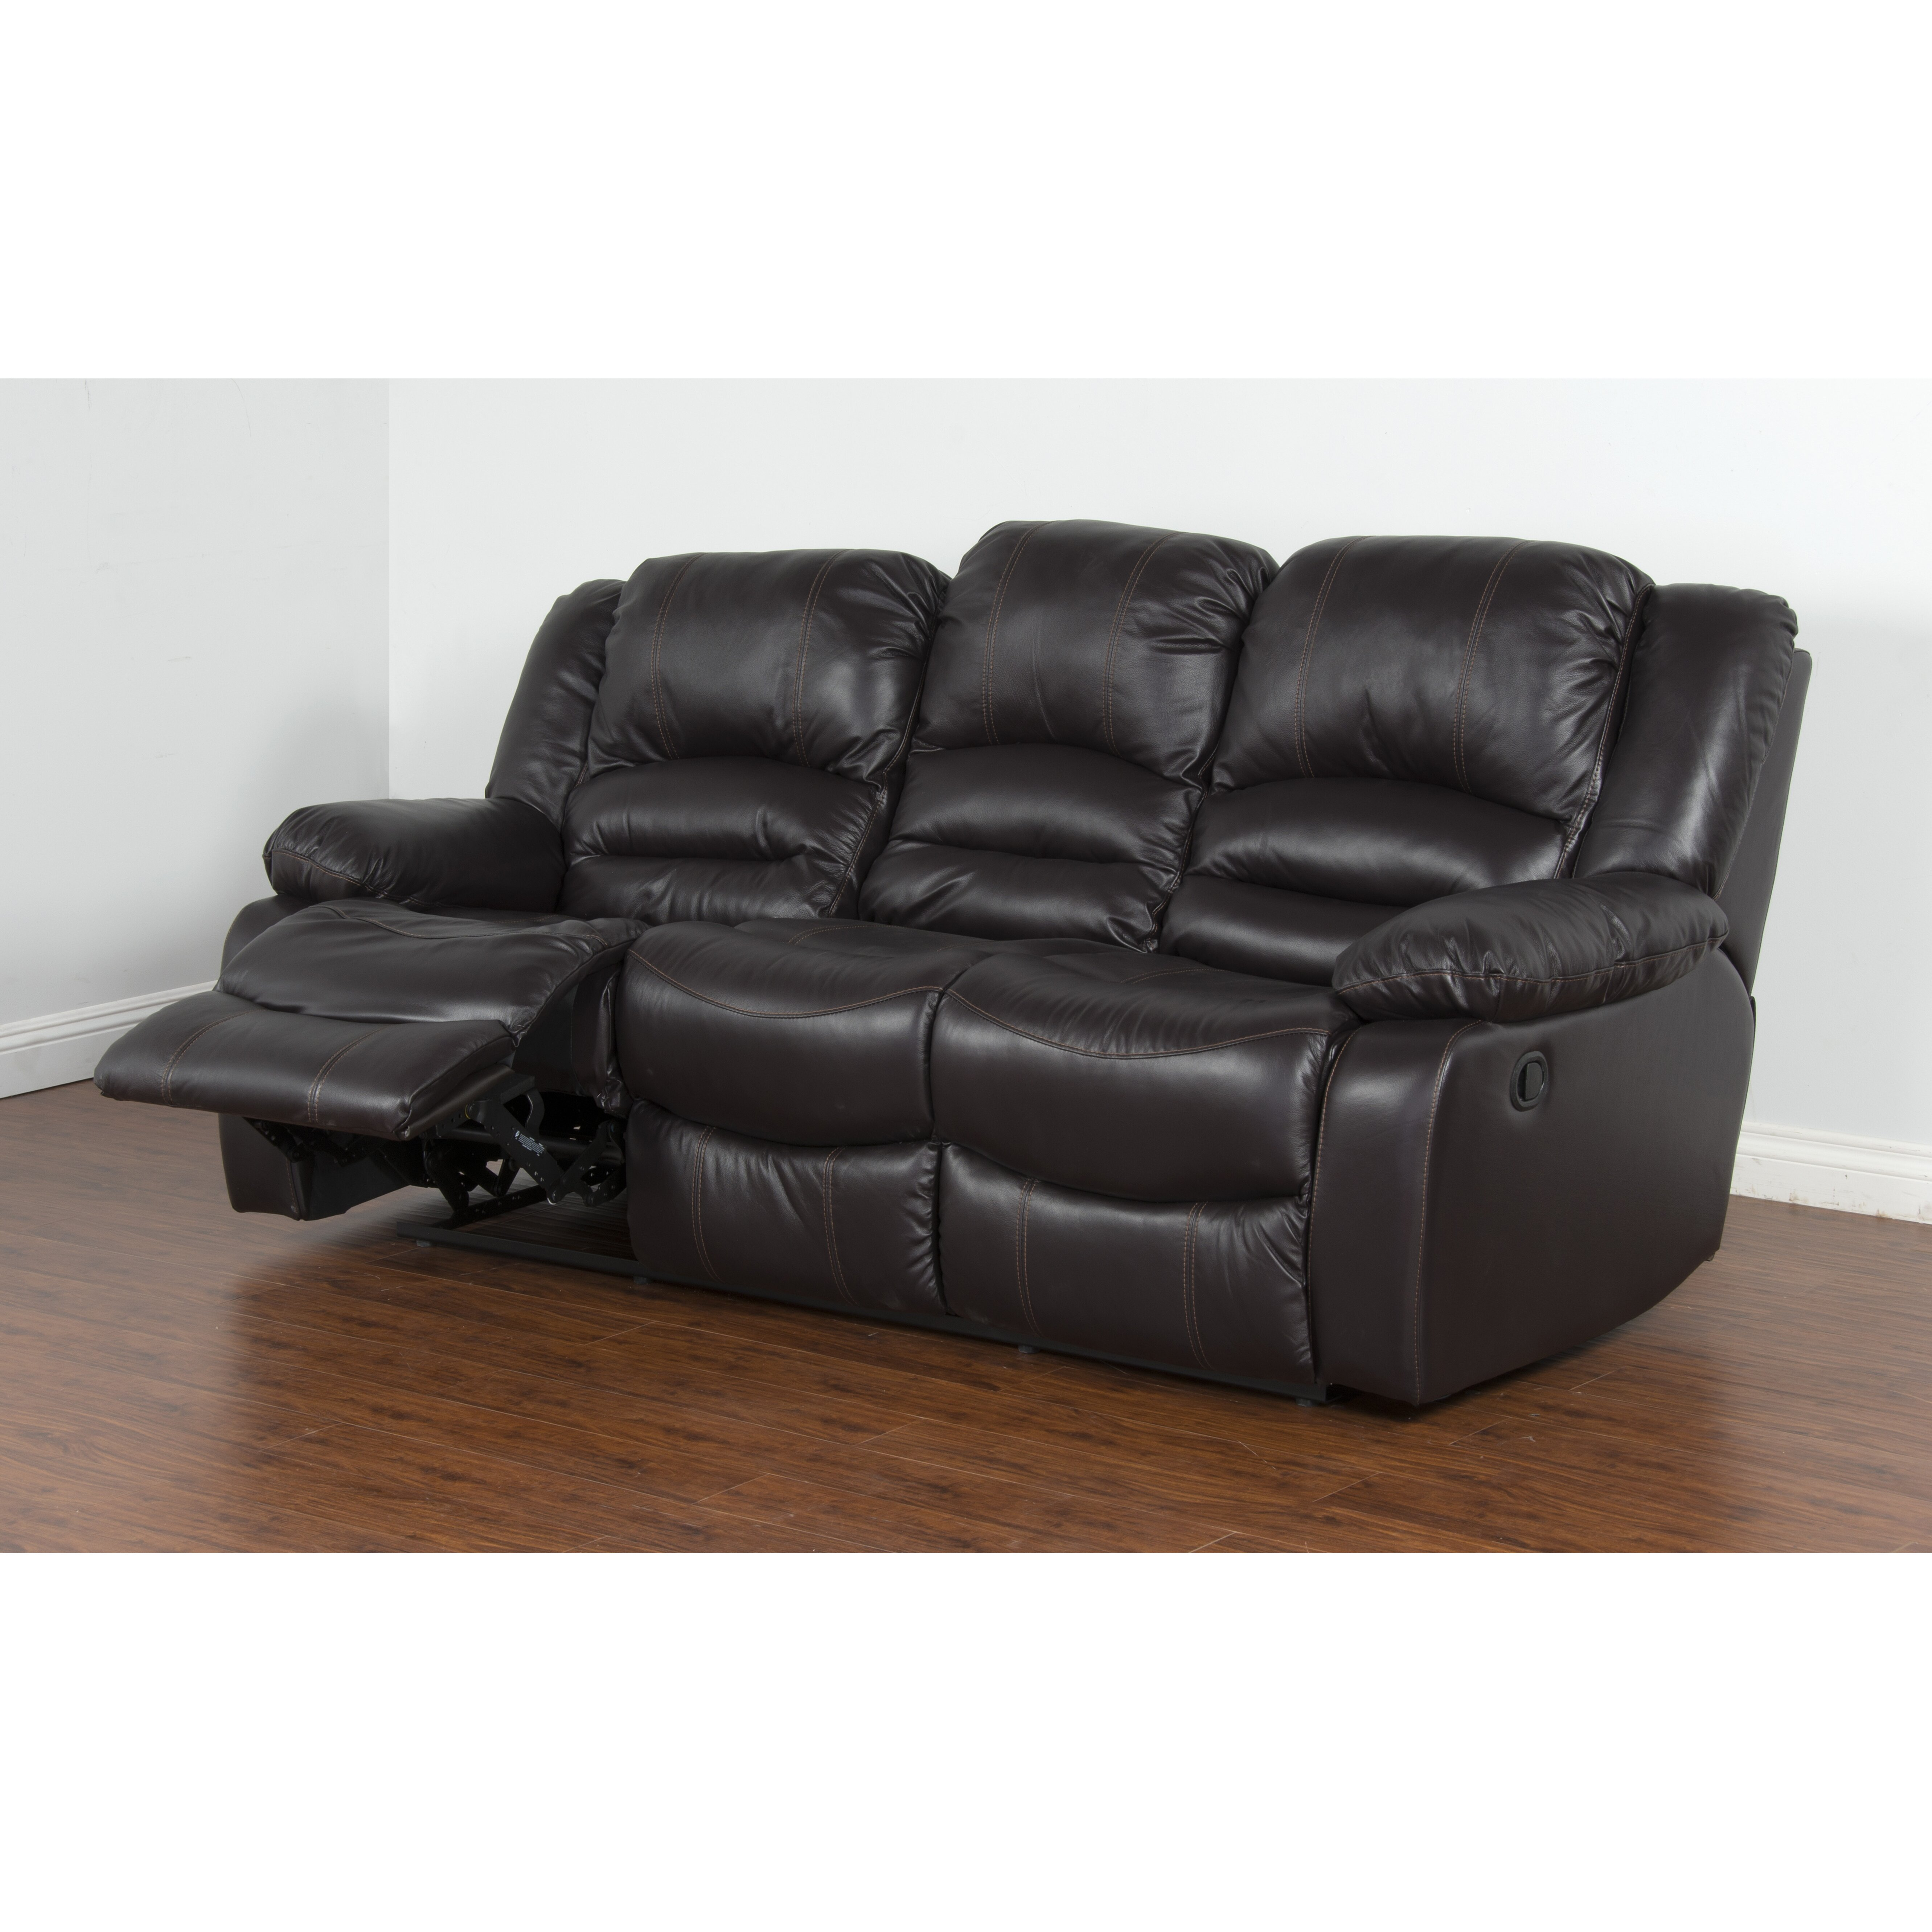 Arizona Dual Reclining Sofa